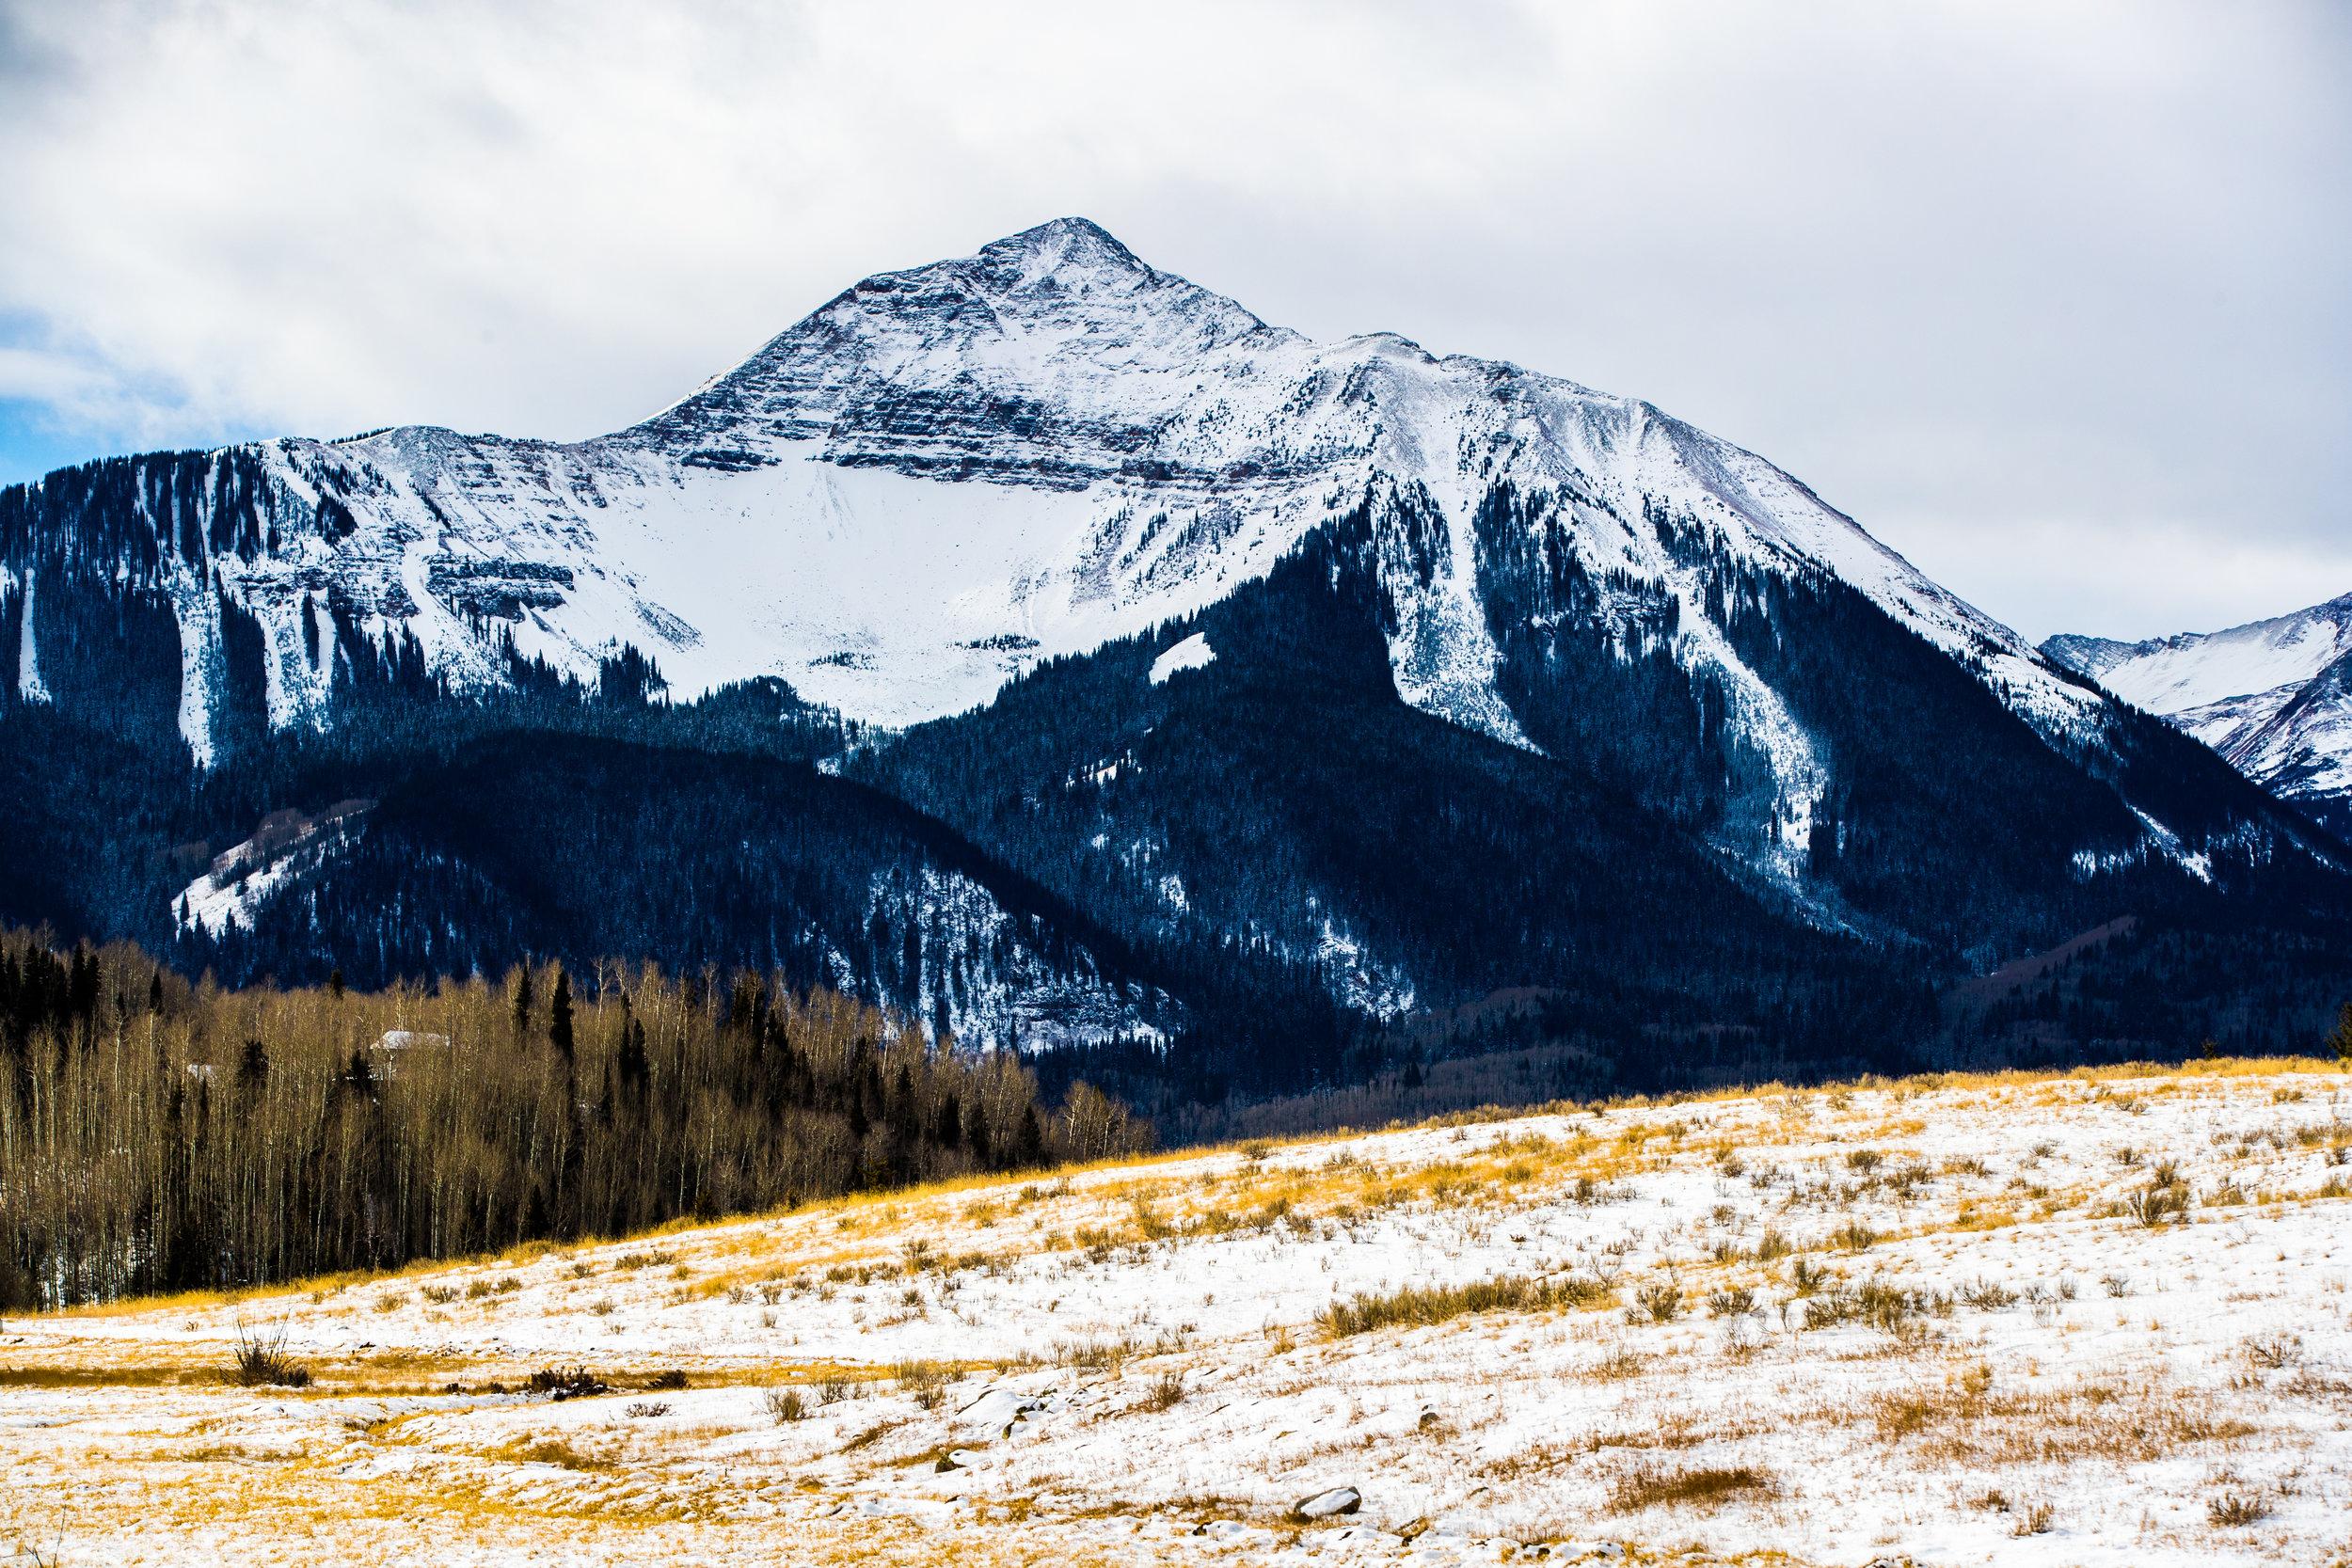 ColoradoA7RII-6.jpg